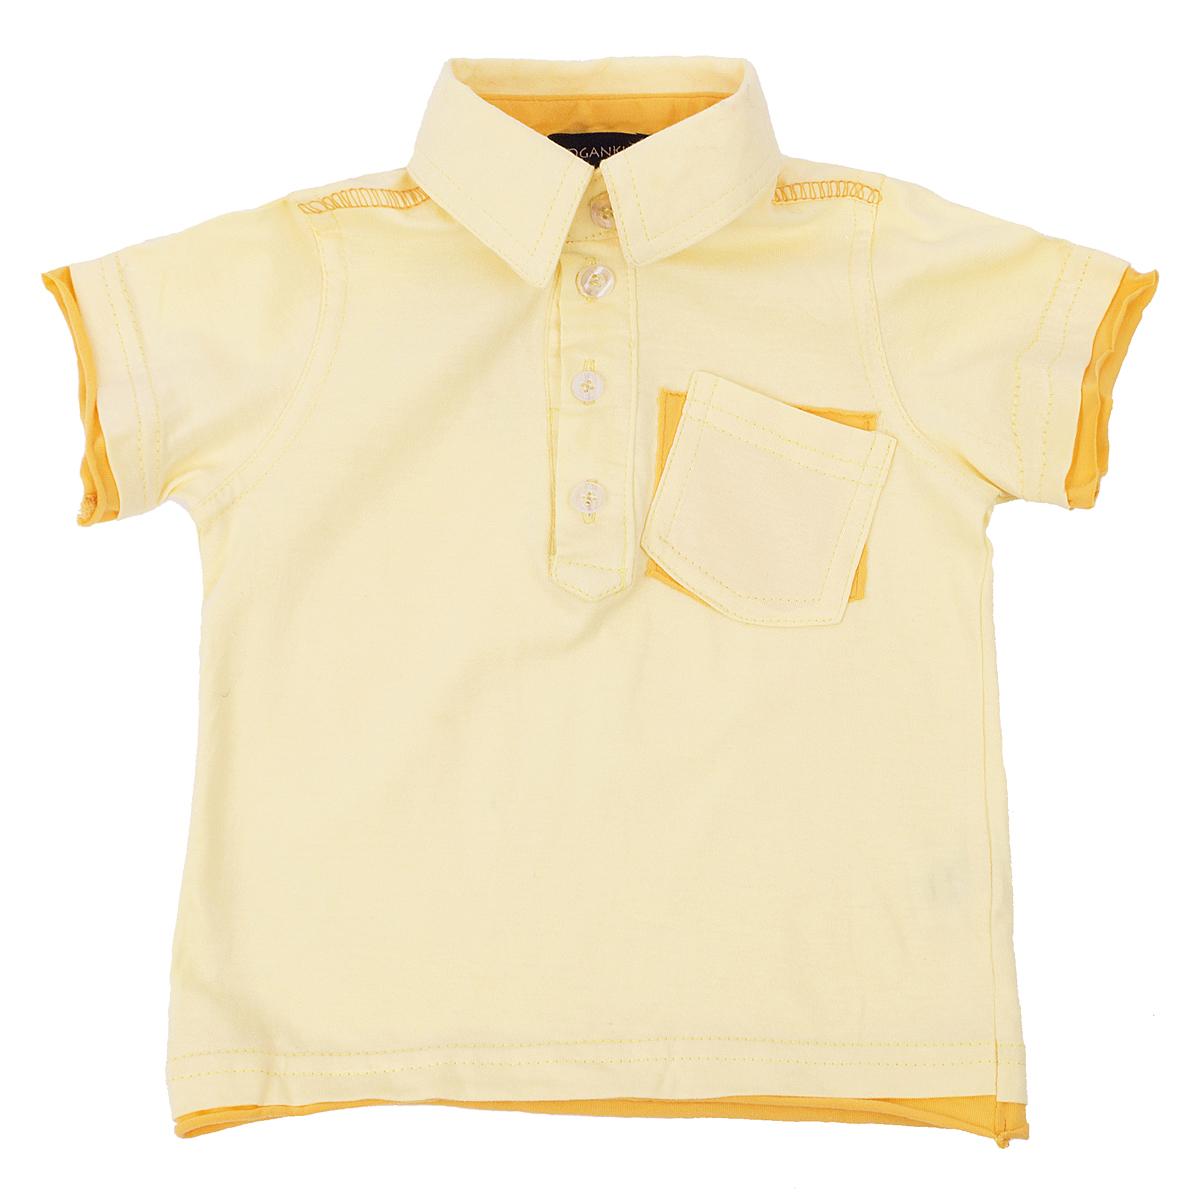 Рубашка-поло Kogankids<br>Размер: 68, 74, 80, 86, 92; Цвет: Жёлтый;